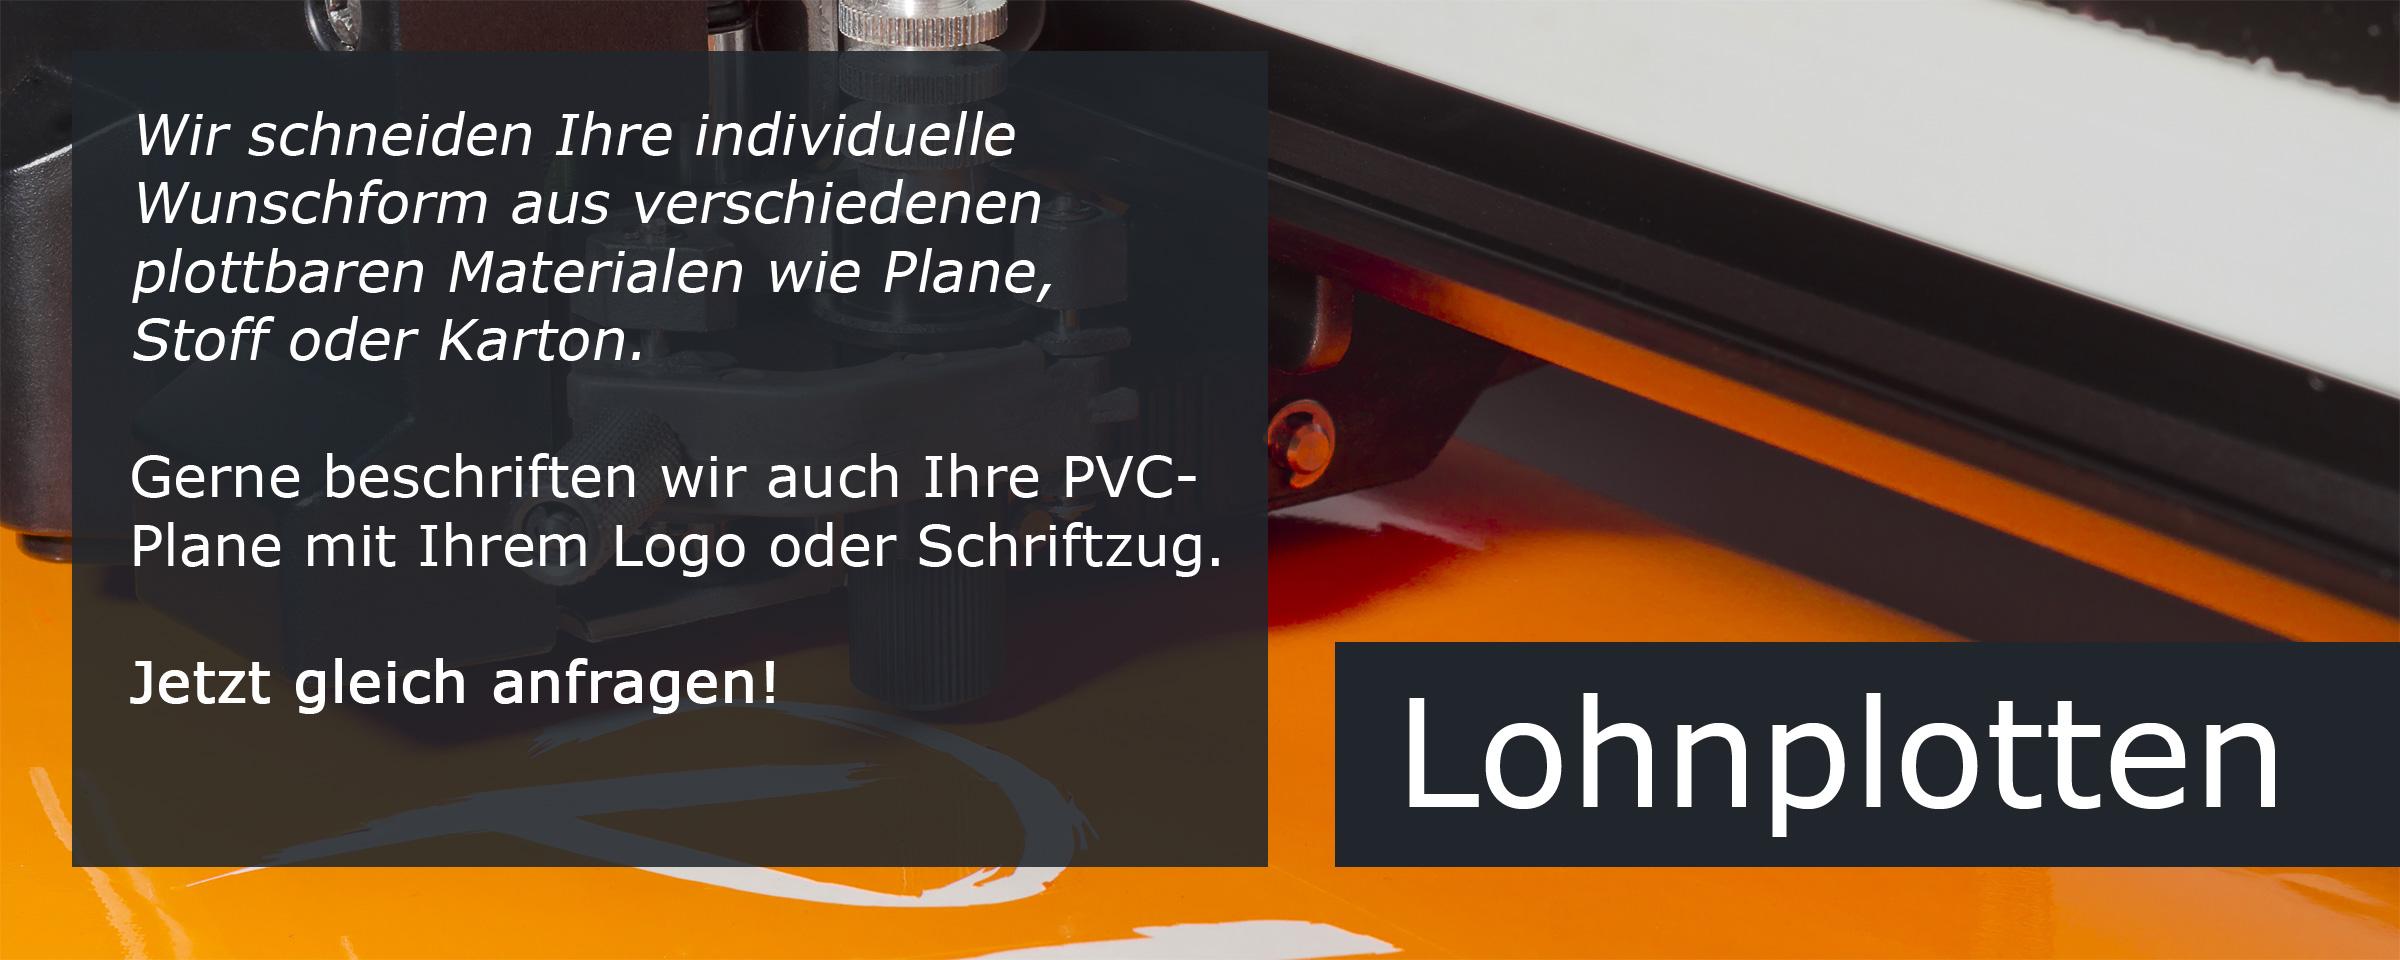 lohnplotten_banner